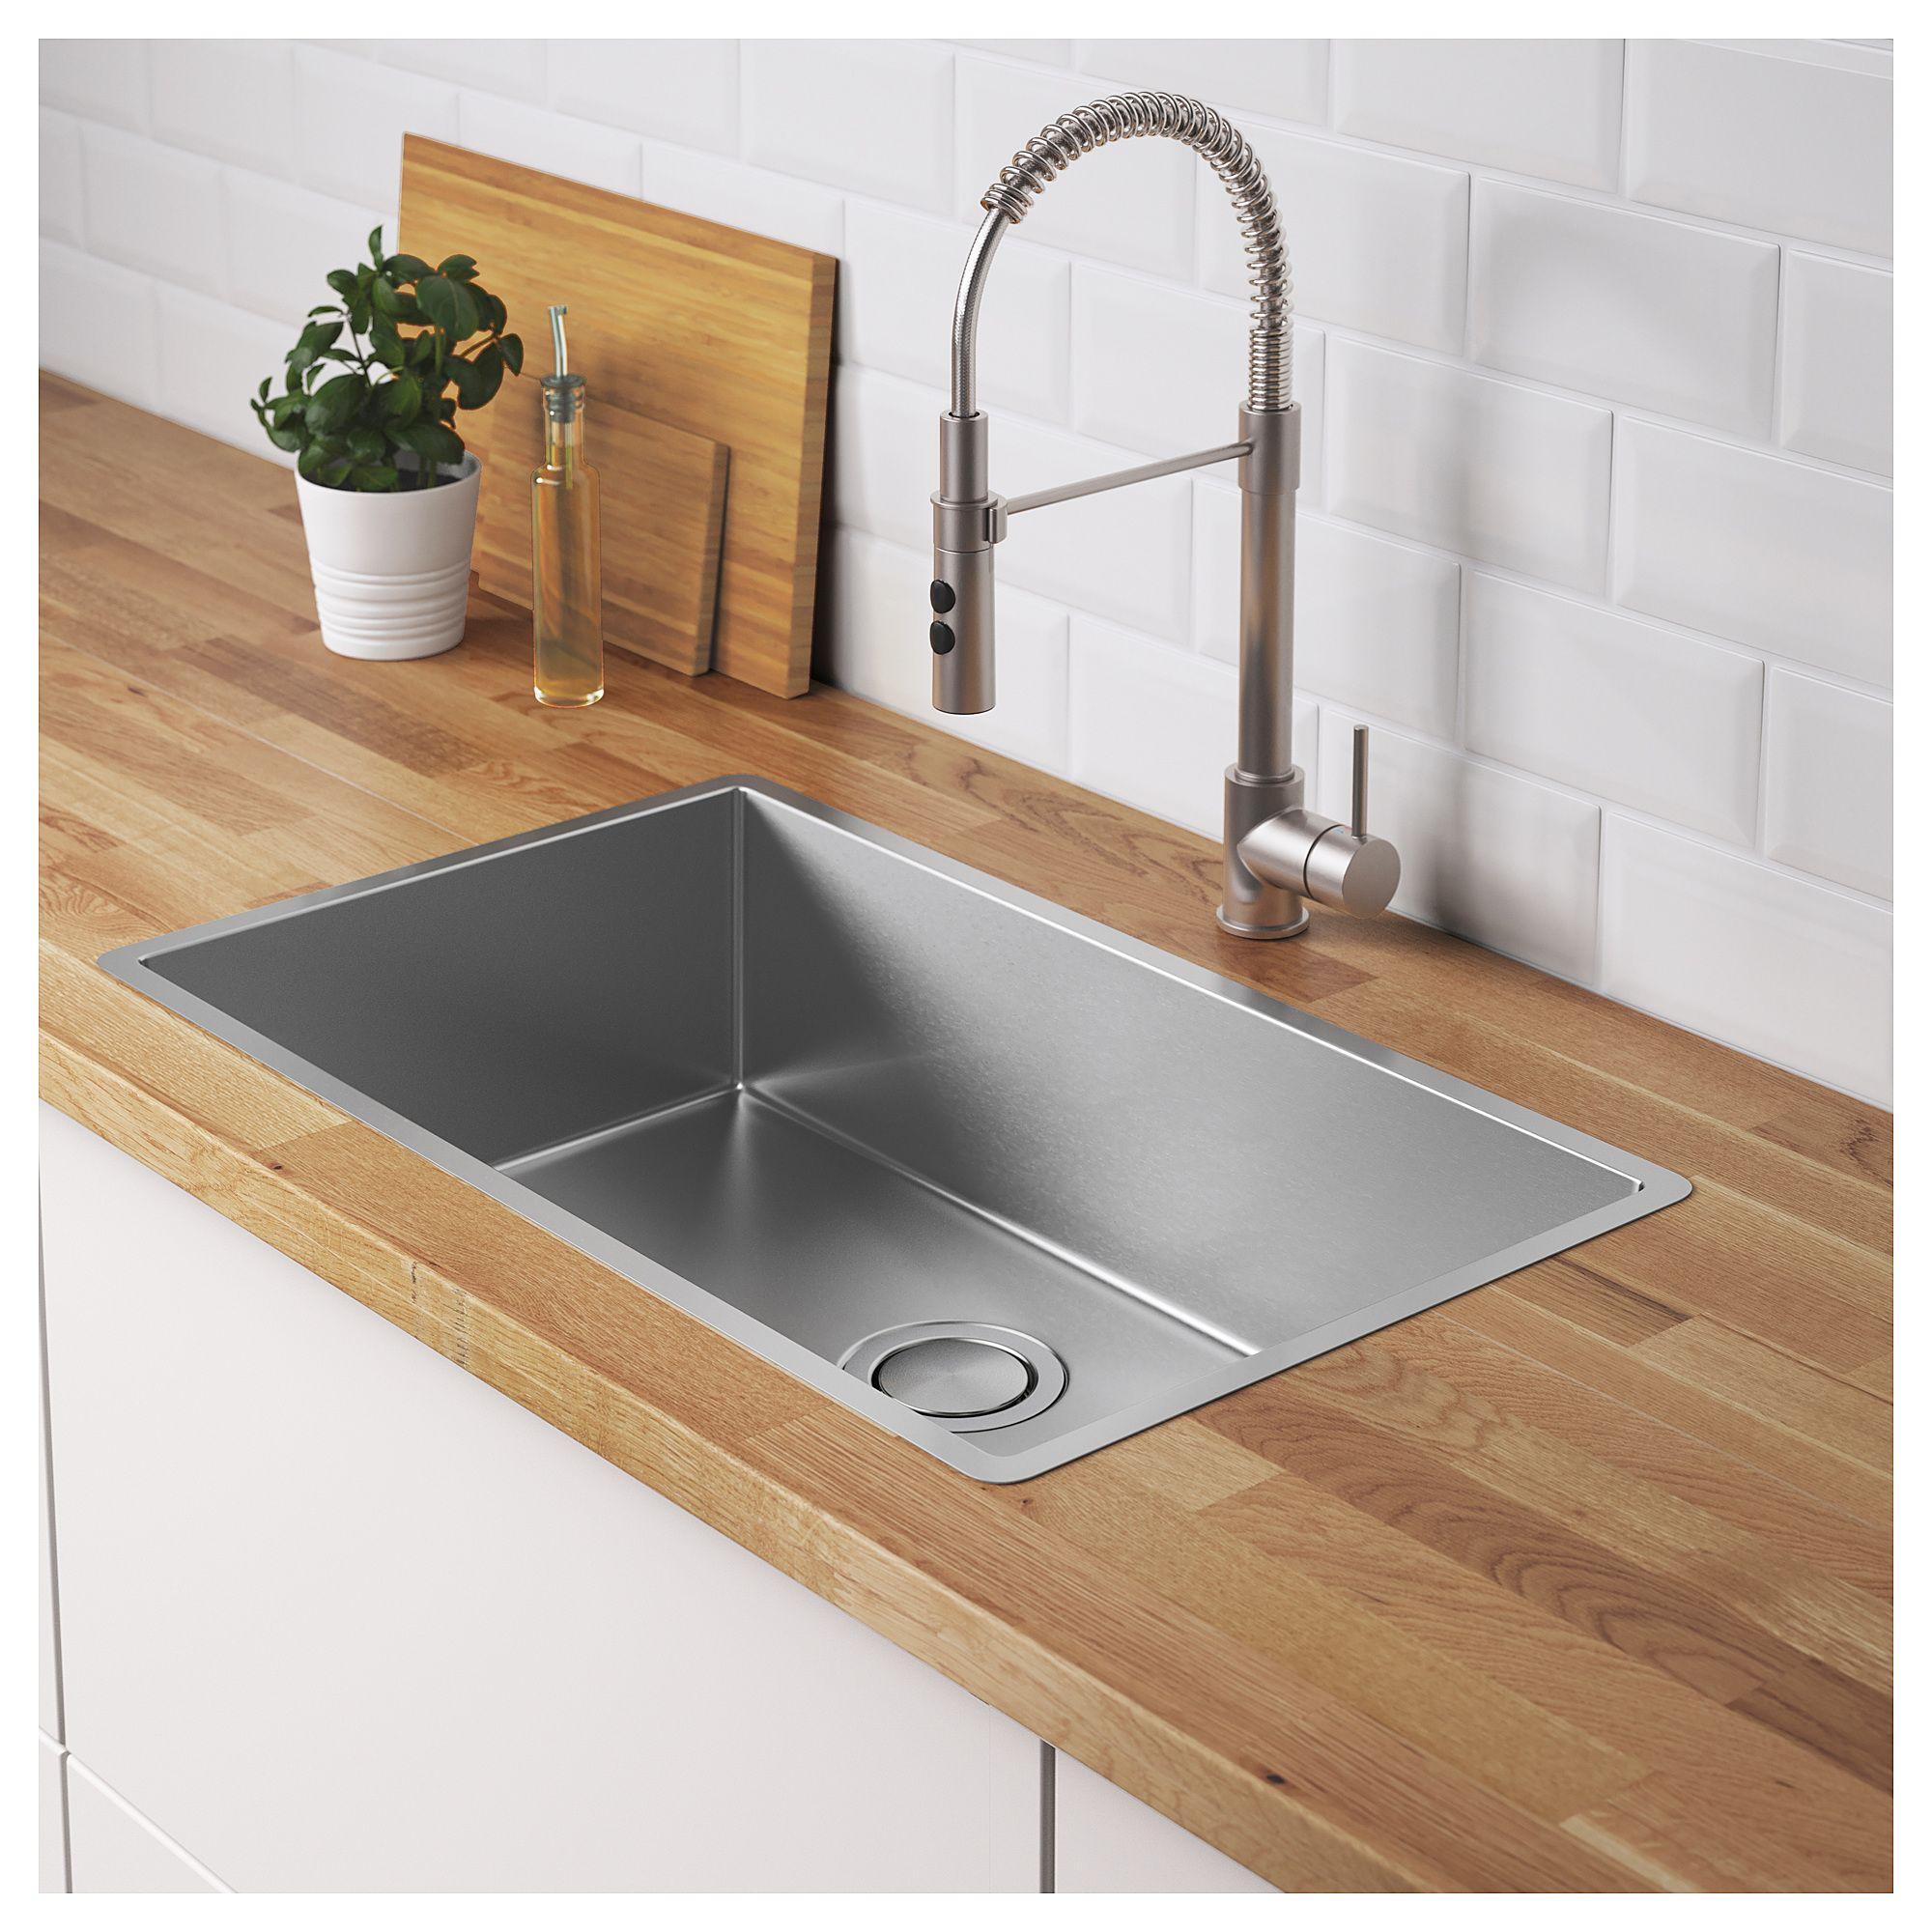 Norrsjon Sink Stainless Steel 29x17 3 8 74x44 Cm Inset